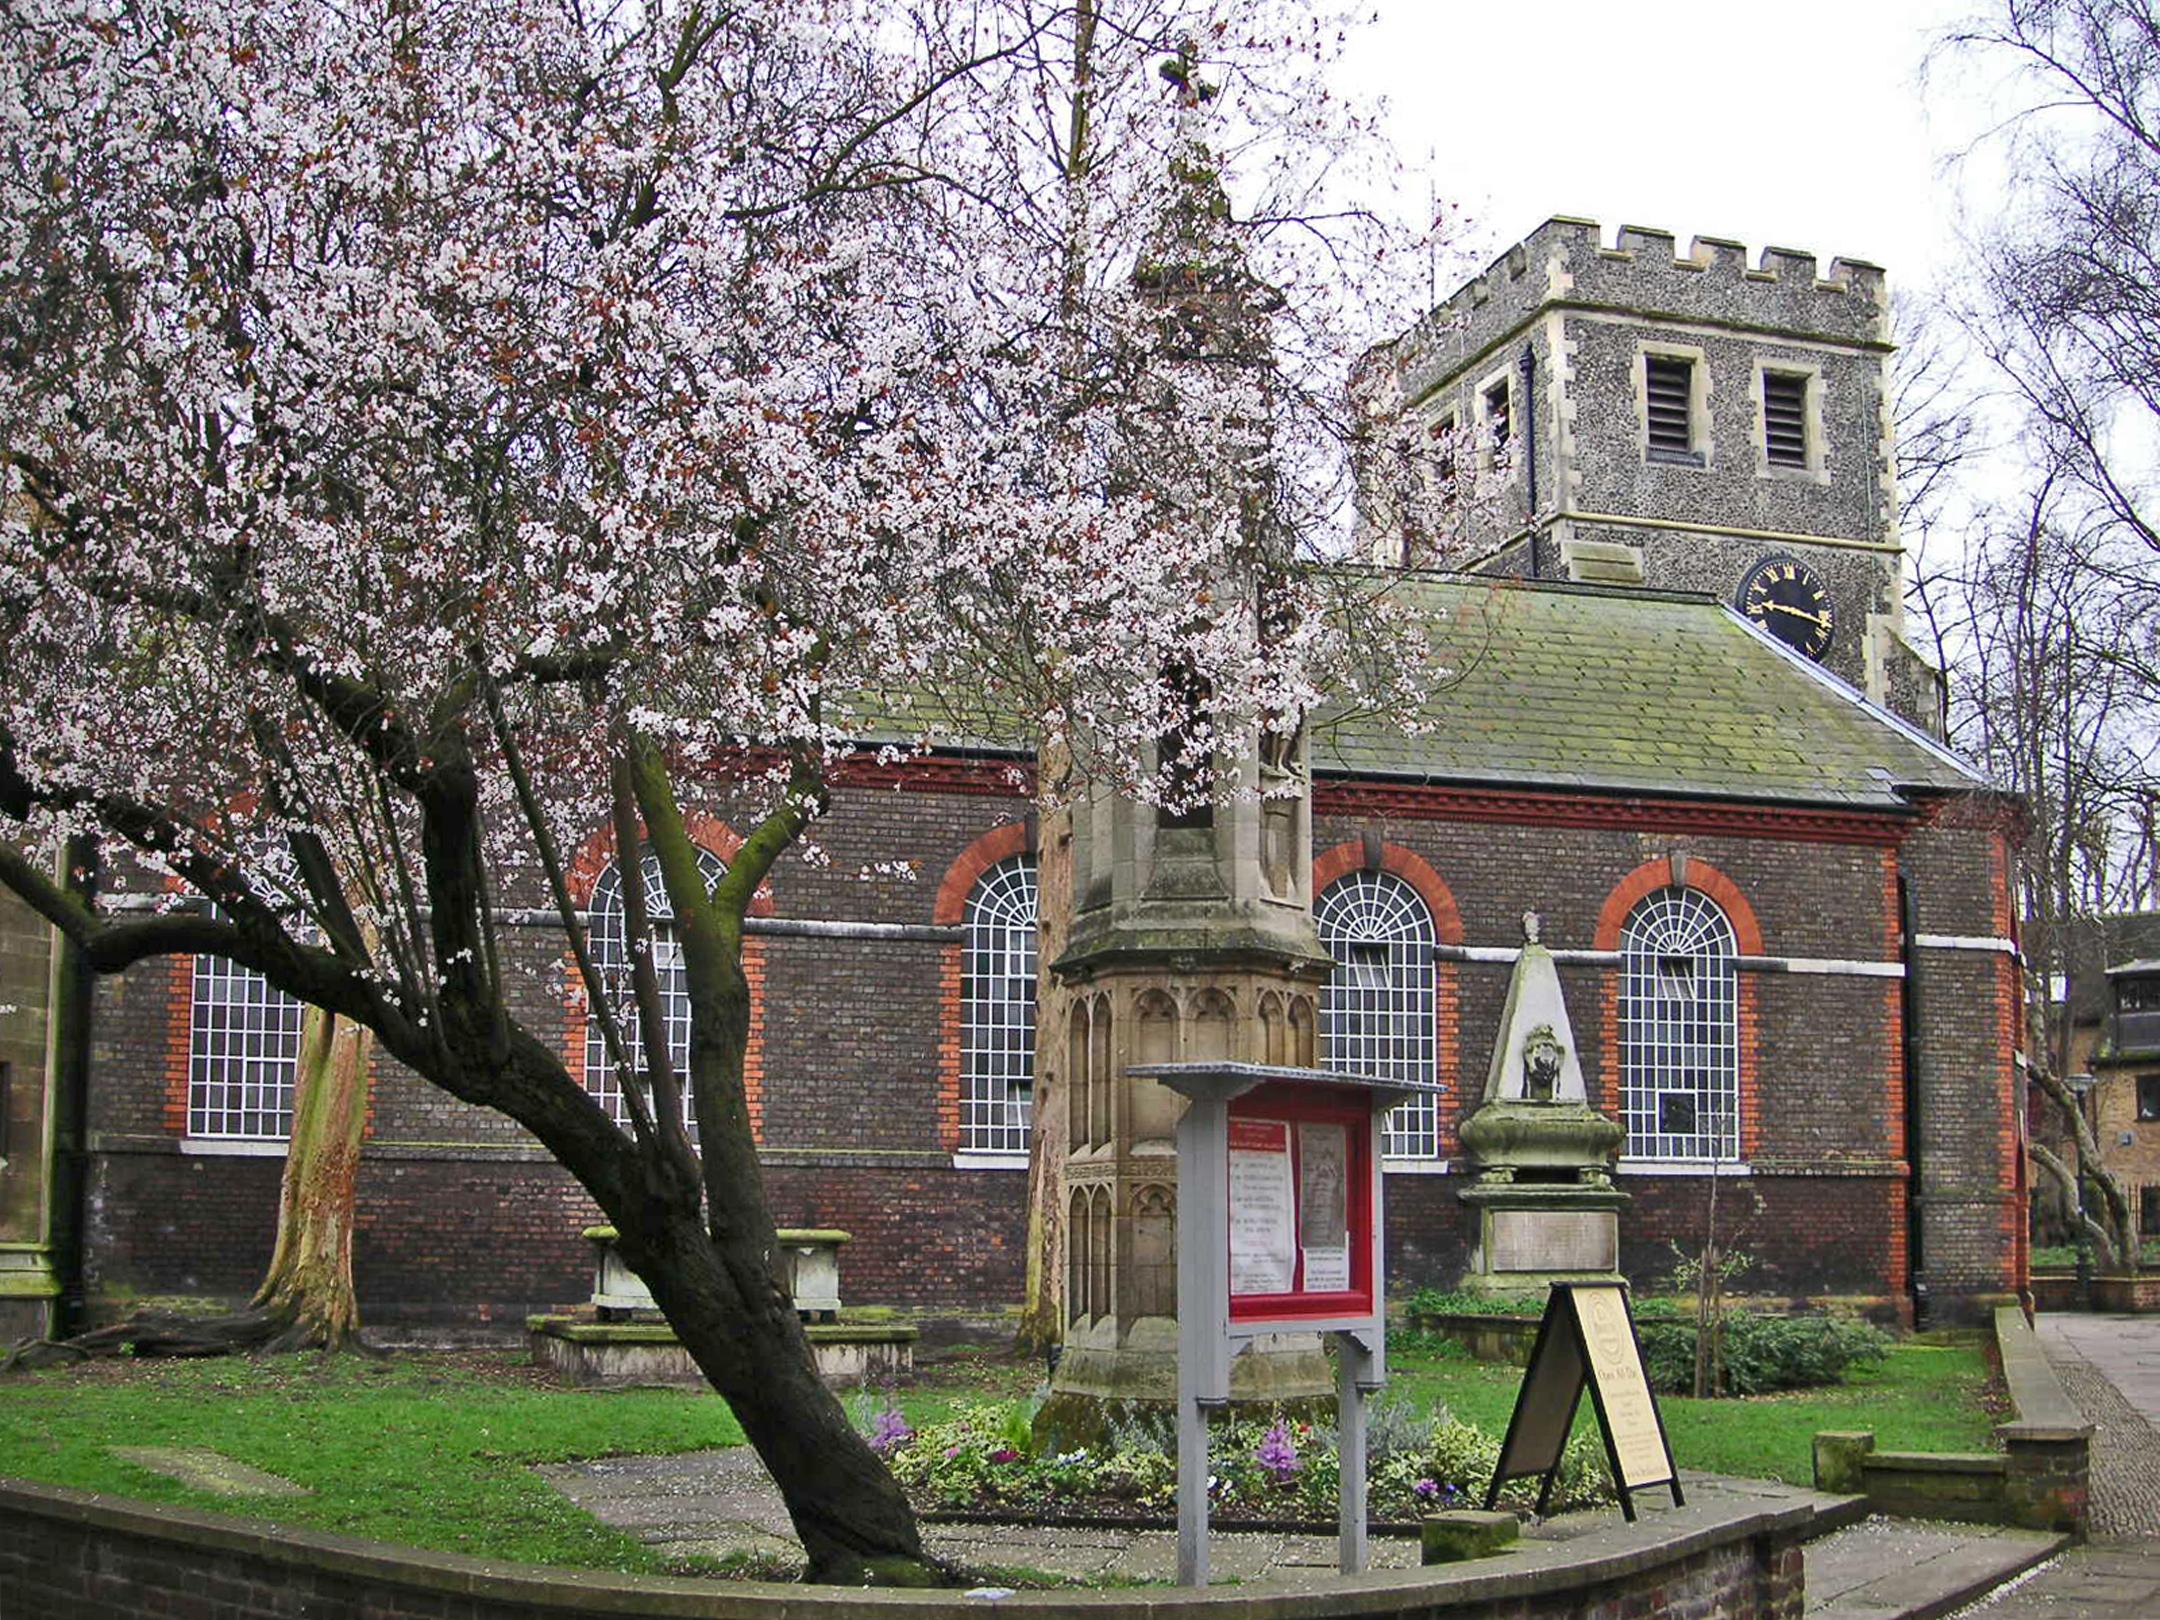 https://upload.wikimedia.org/wikipedia/commons/0/0f/Richmond_St_Mary_Magdalene%27s_Church_003.jpg